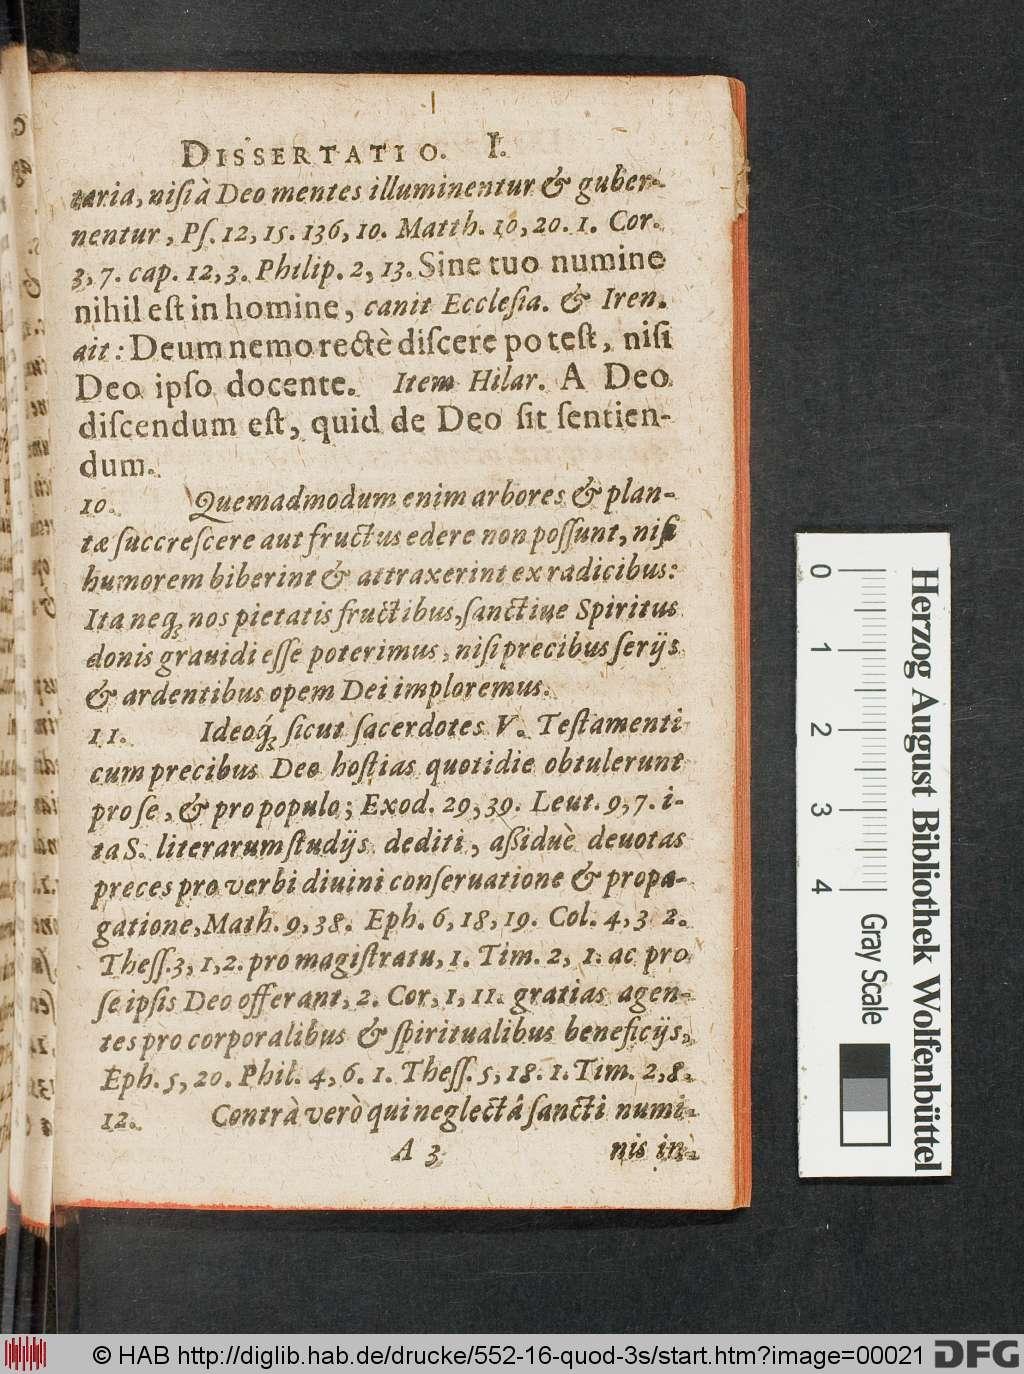 http://diglib.hab.de/drucke/552-16-quod-3s/00021.jpg